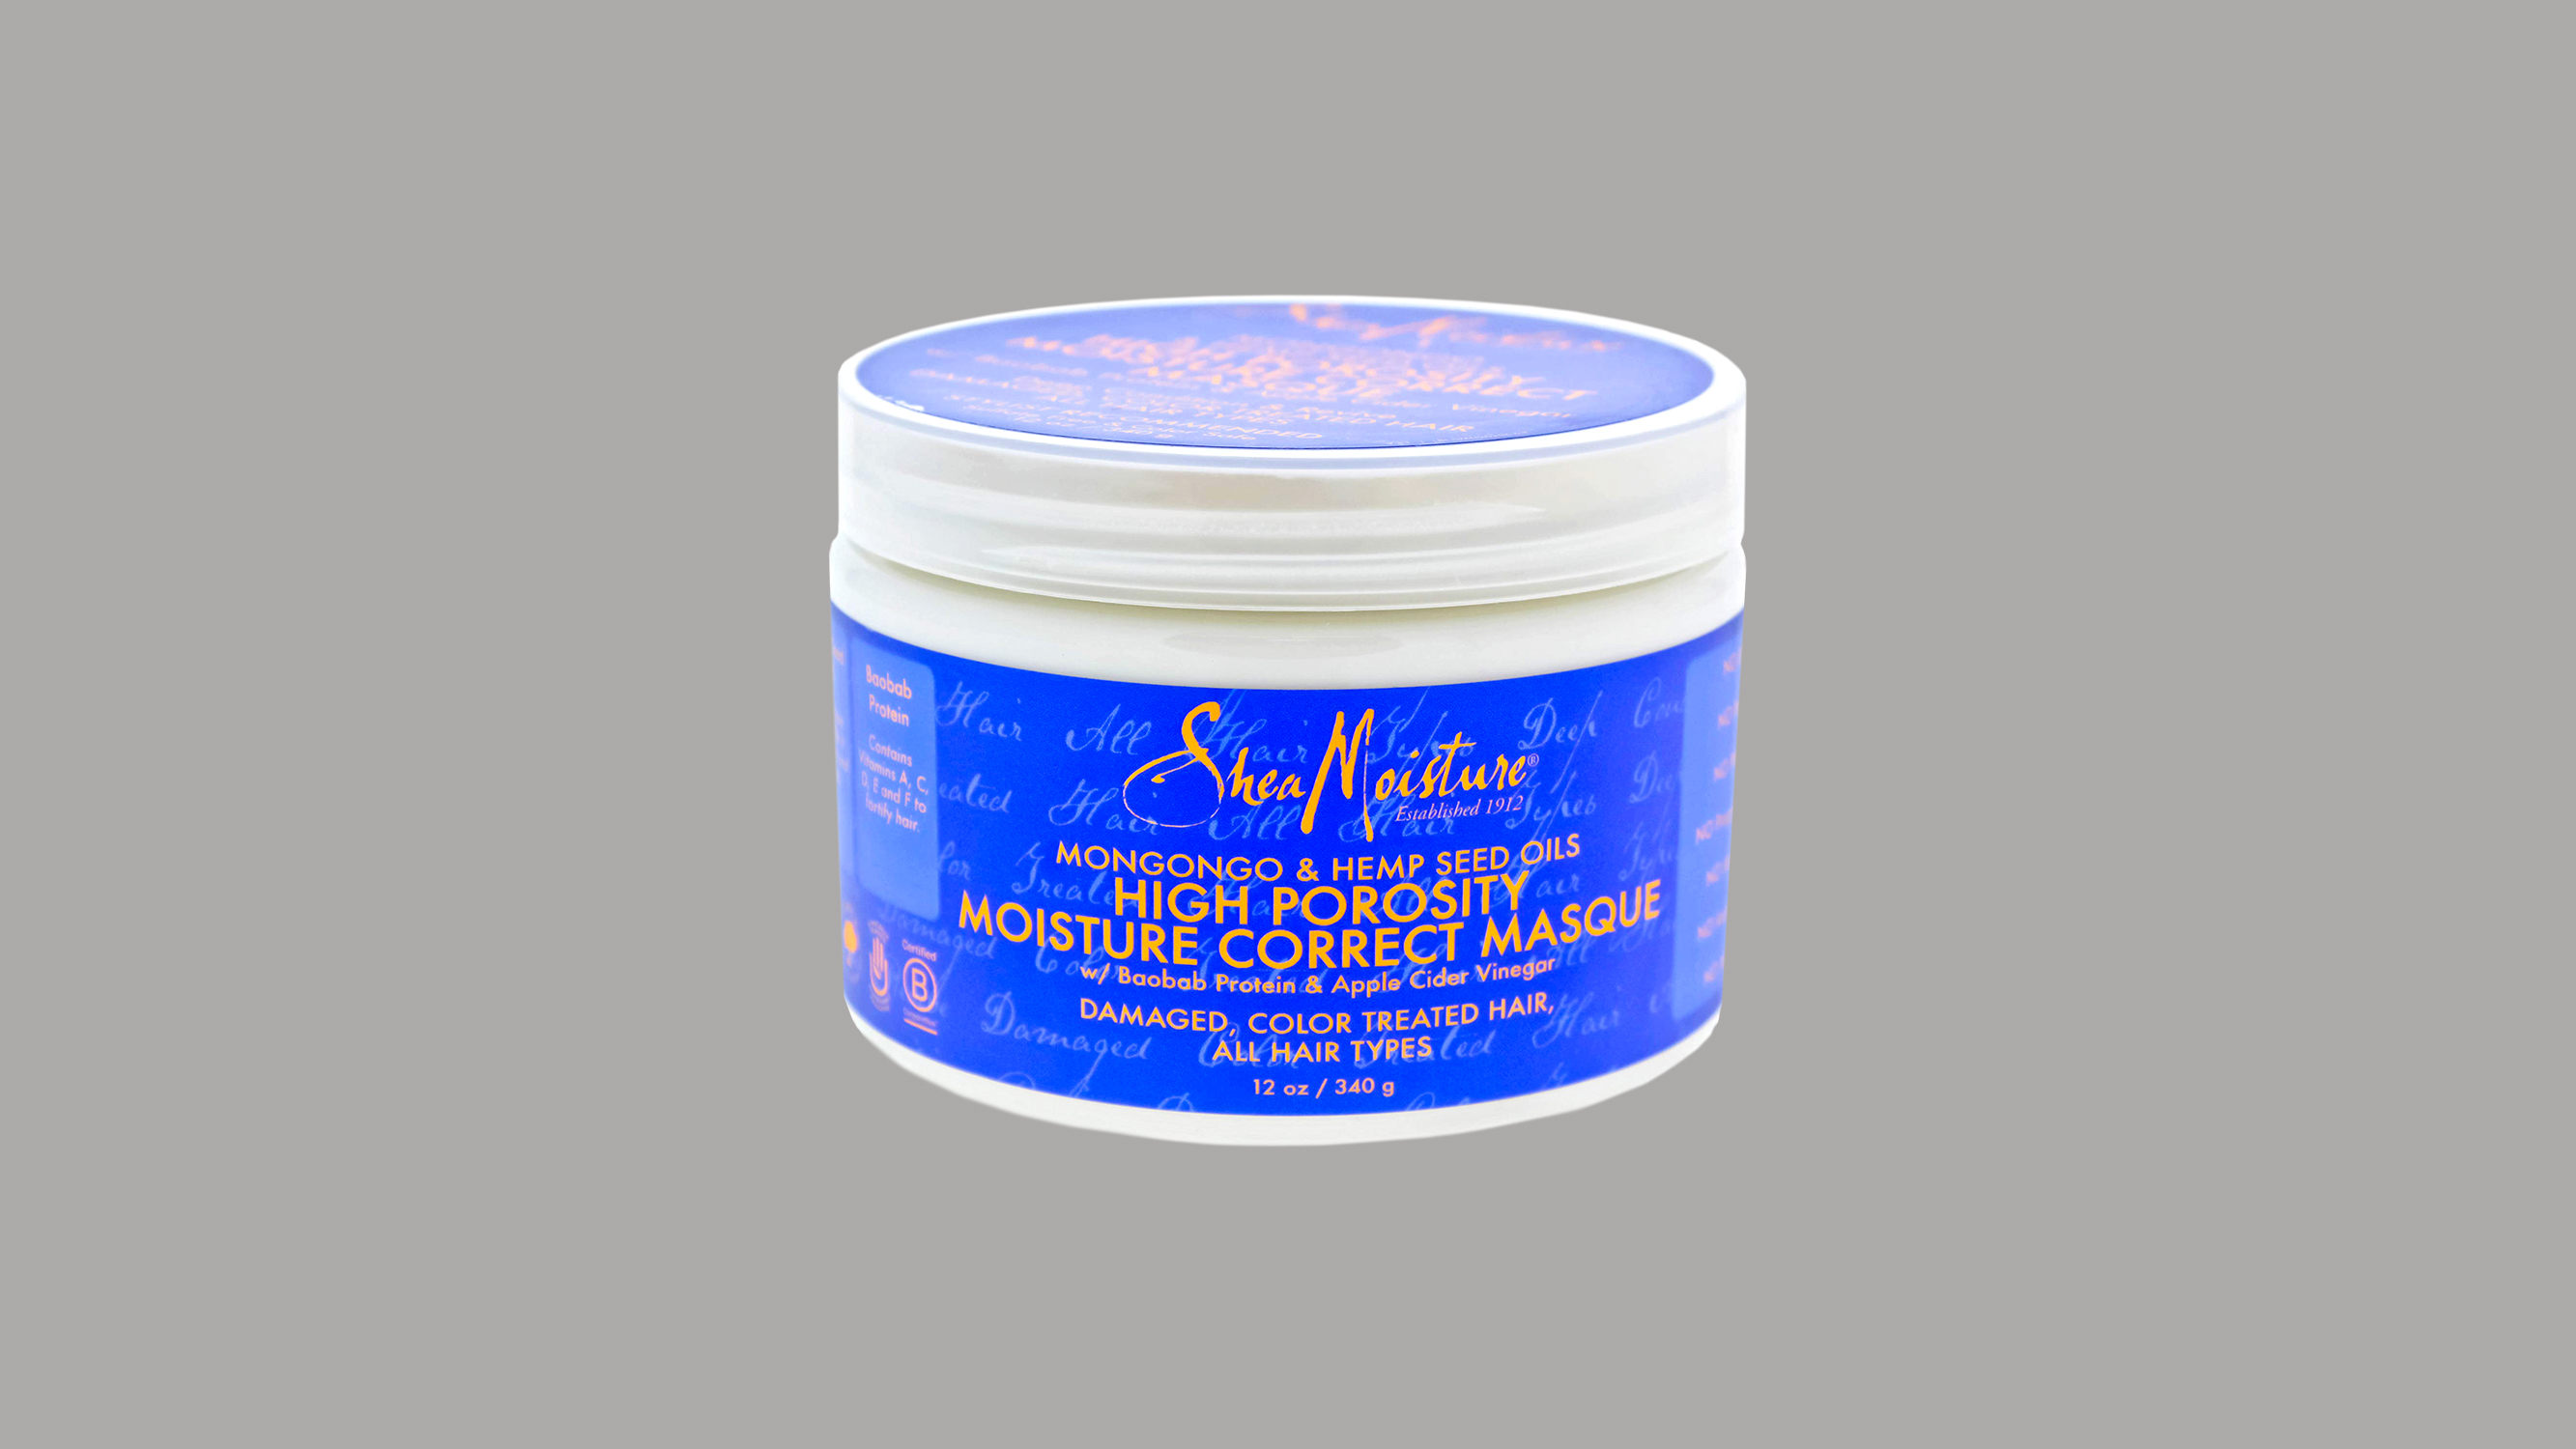 Shea Moisture High Porosity Moisture Correct Masque